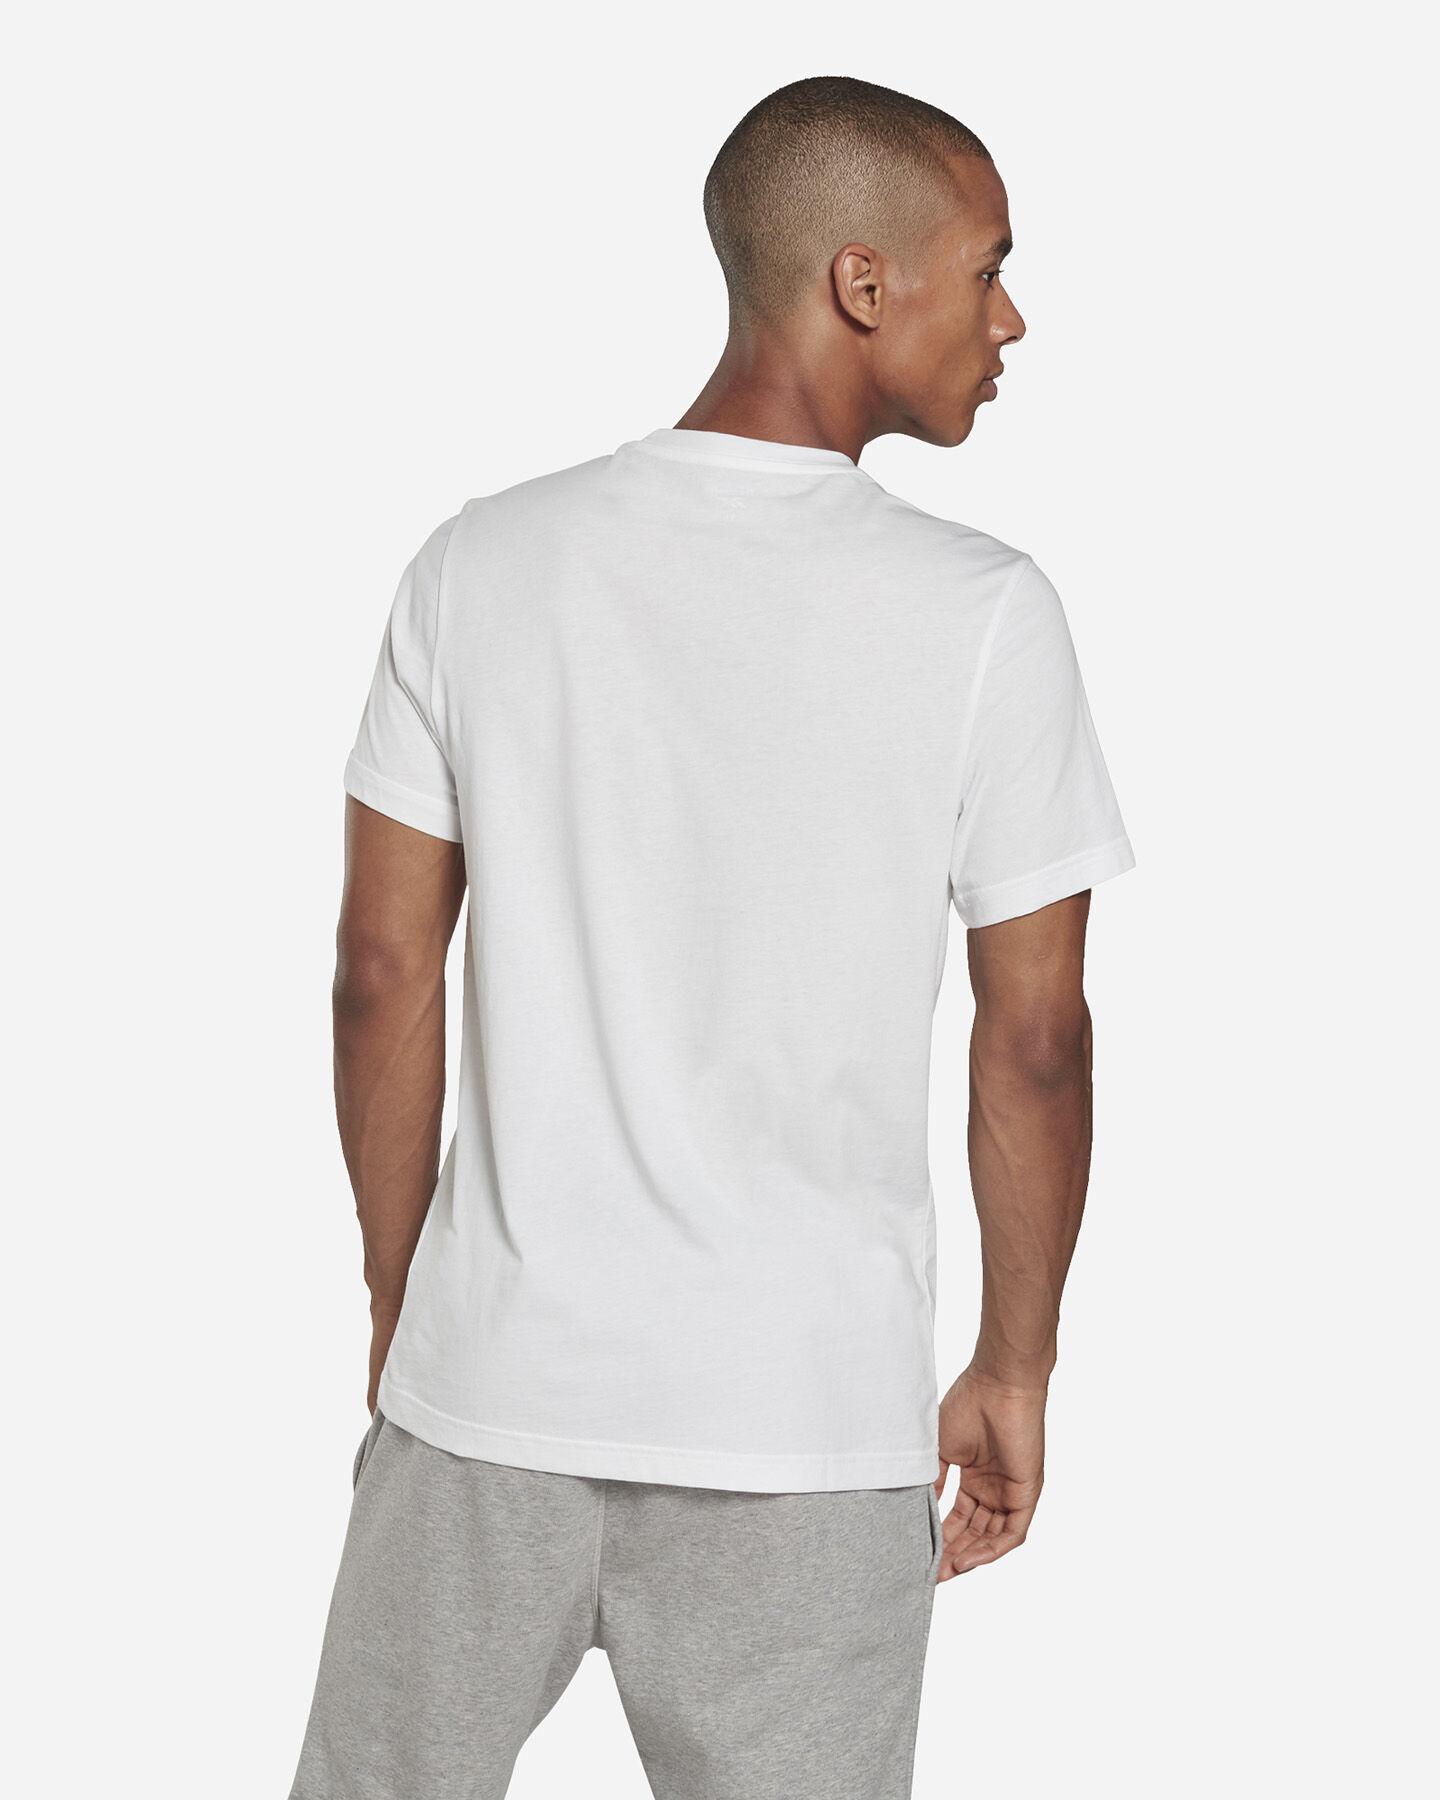 T-Shirt REEBOK CLASSIC LOGO M S5280183 scatto 3